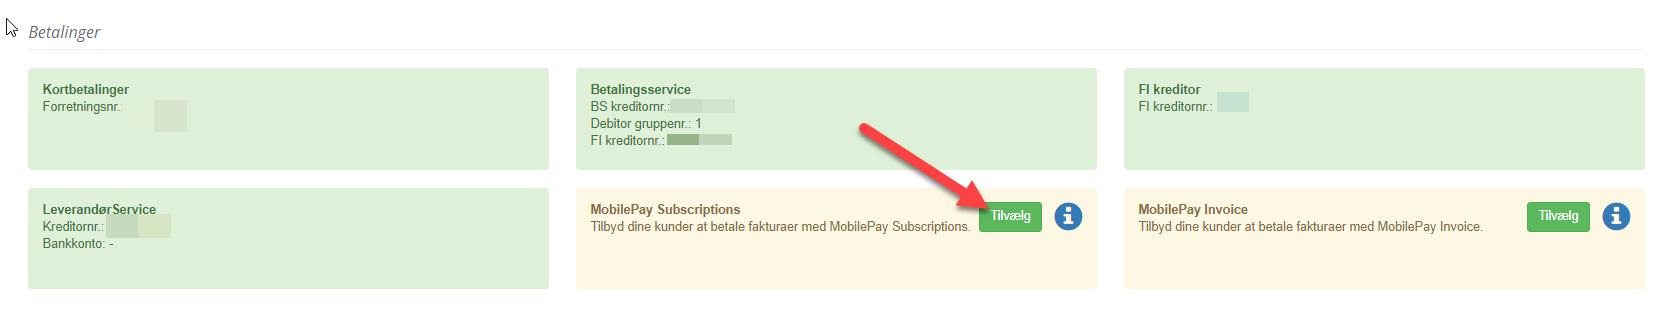 Tilvælg MobilePay Subscriptions